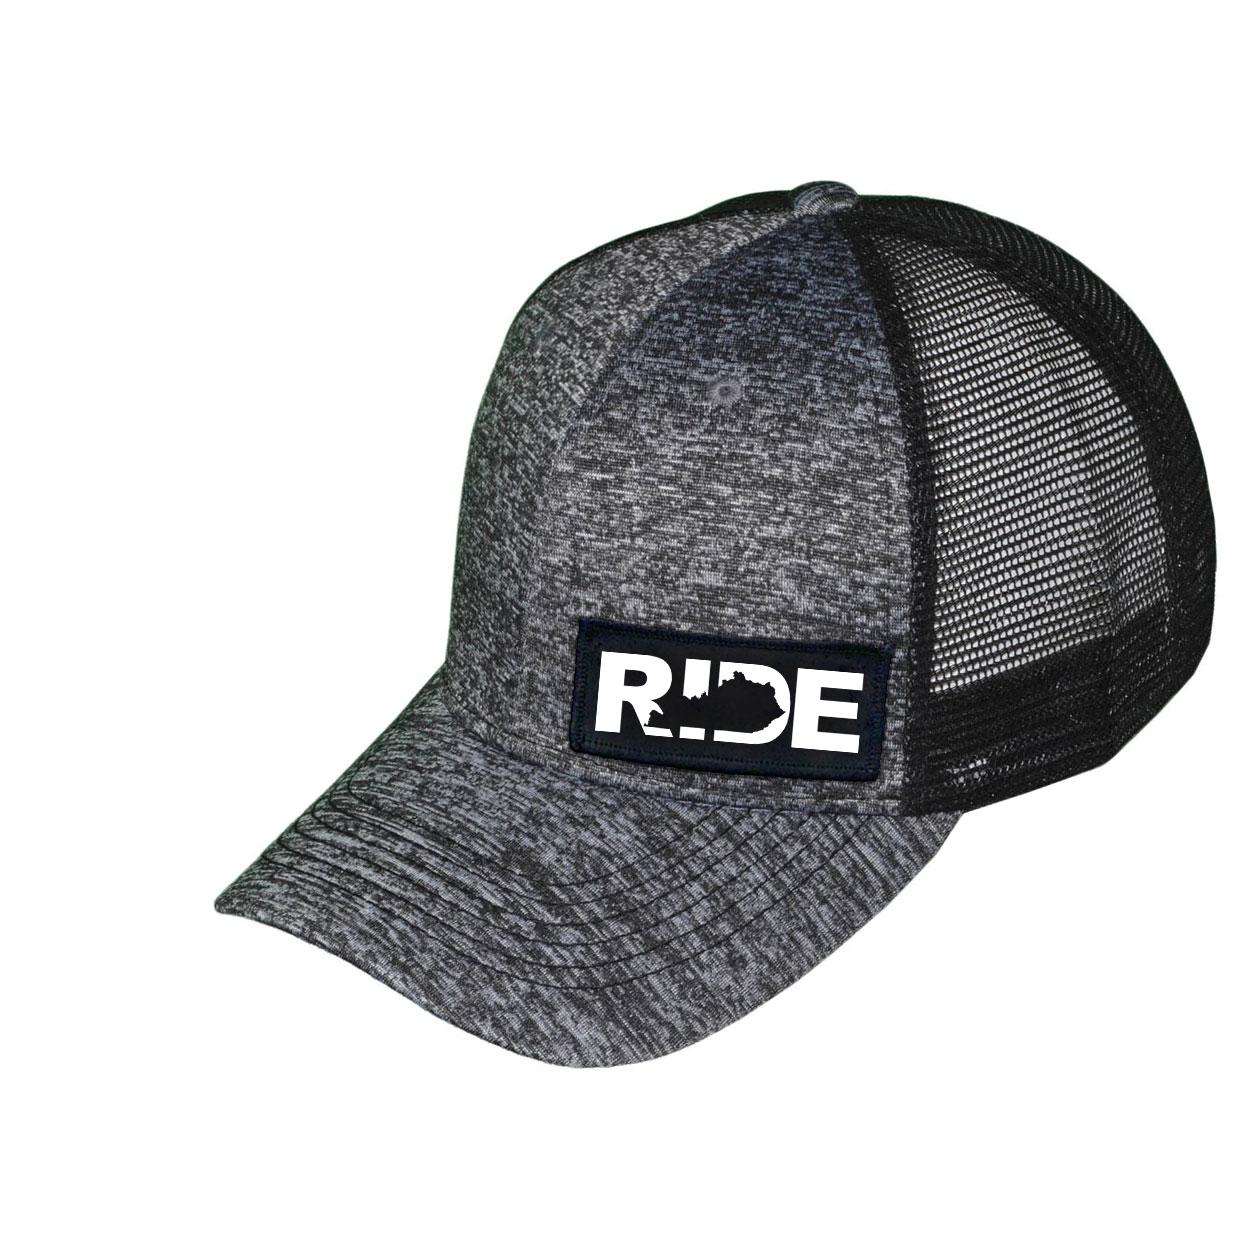 Ride Kentucky Night Out Woven Patch Melange Snapback Trucker Hat Gray/Black (White Logo)